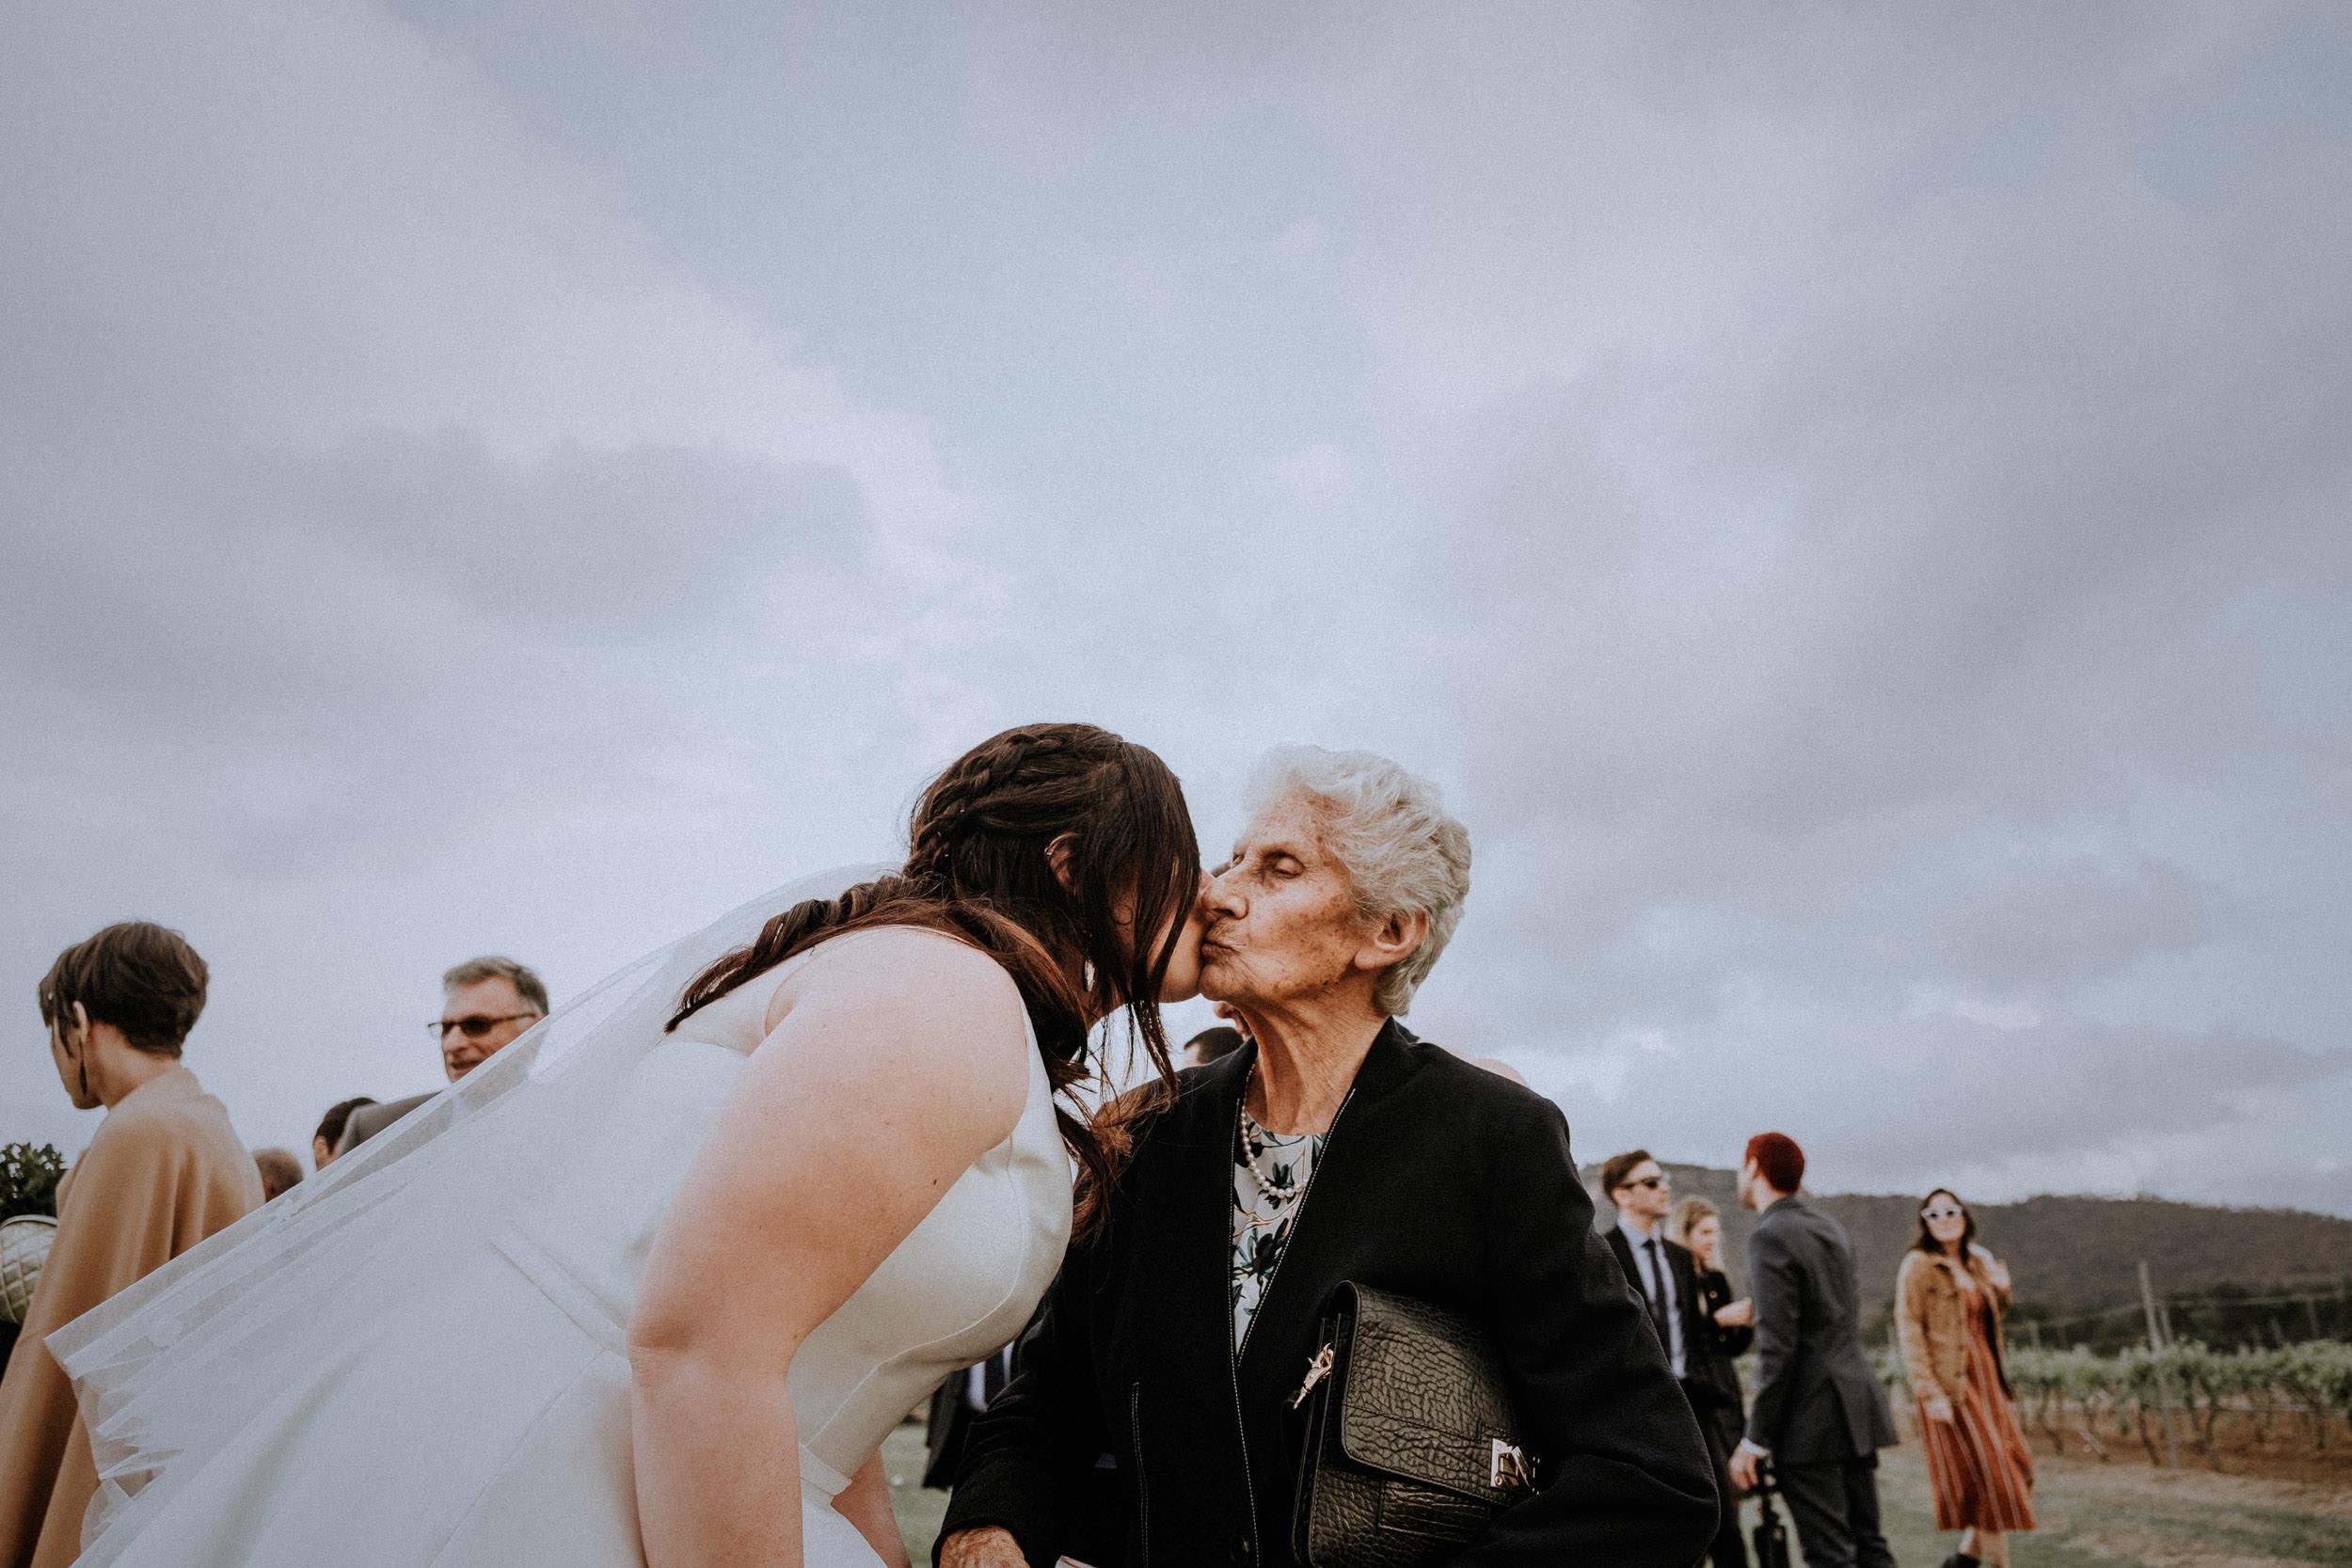 s+j_top_elopement wedding photography_kings & thieves_blog - 367.jpg